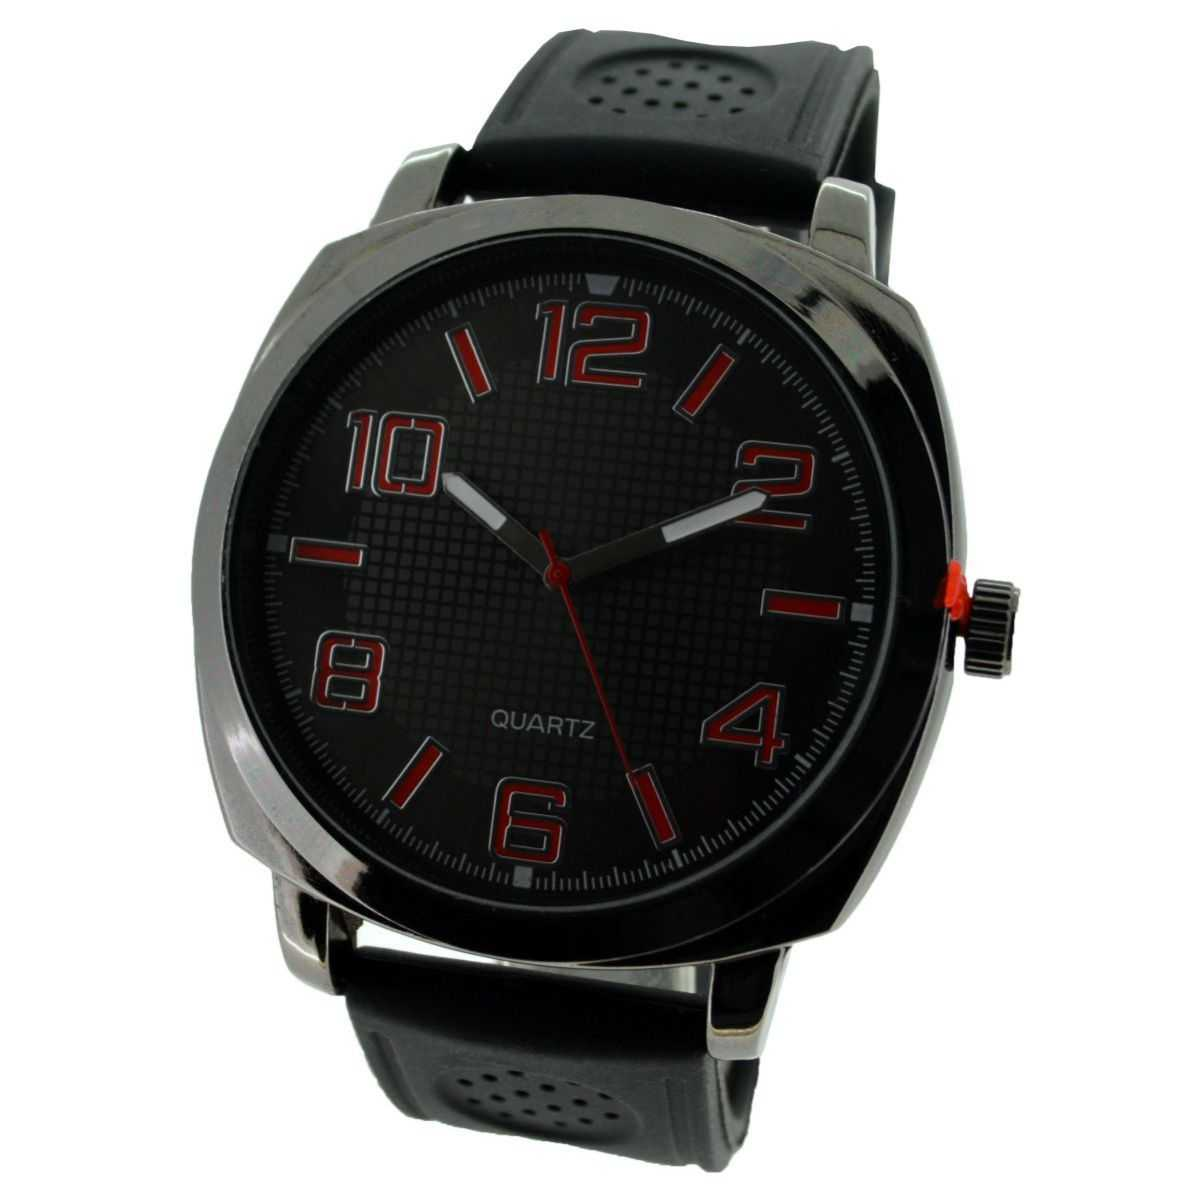 Relógio Personalizado 2464-9